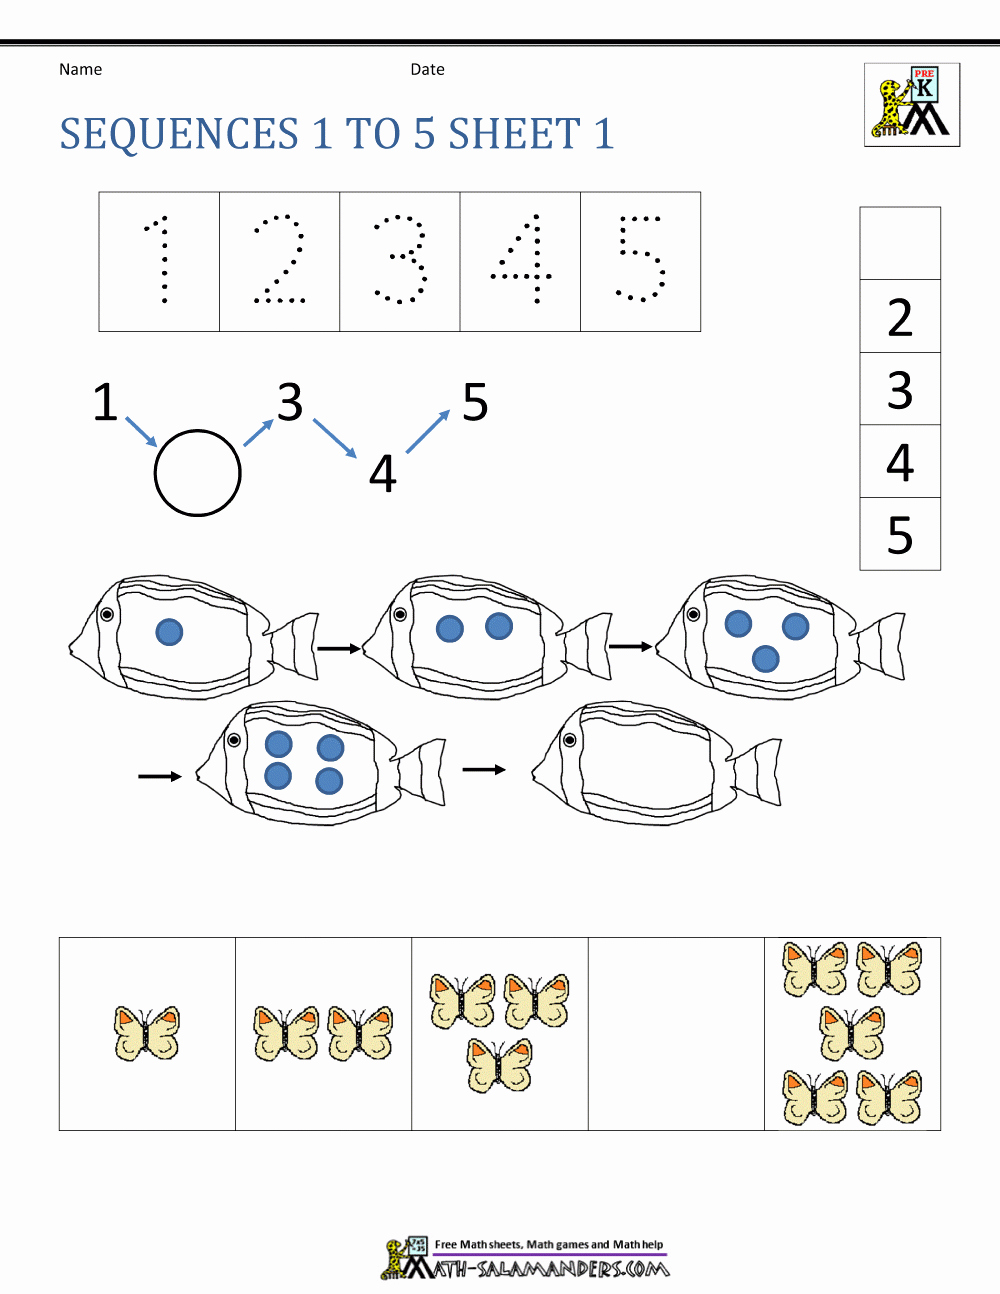 Sequence Worksheets 3rd Grade Best Of Number Sequence Worksheets 3rd Grade